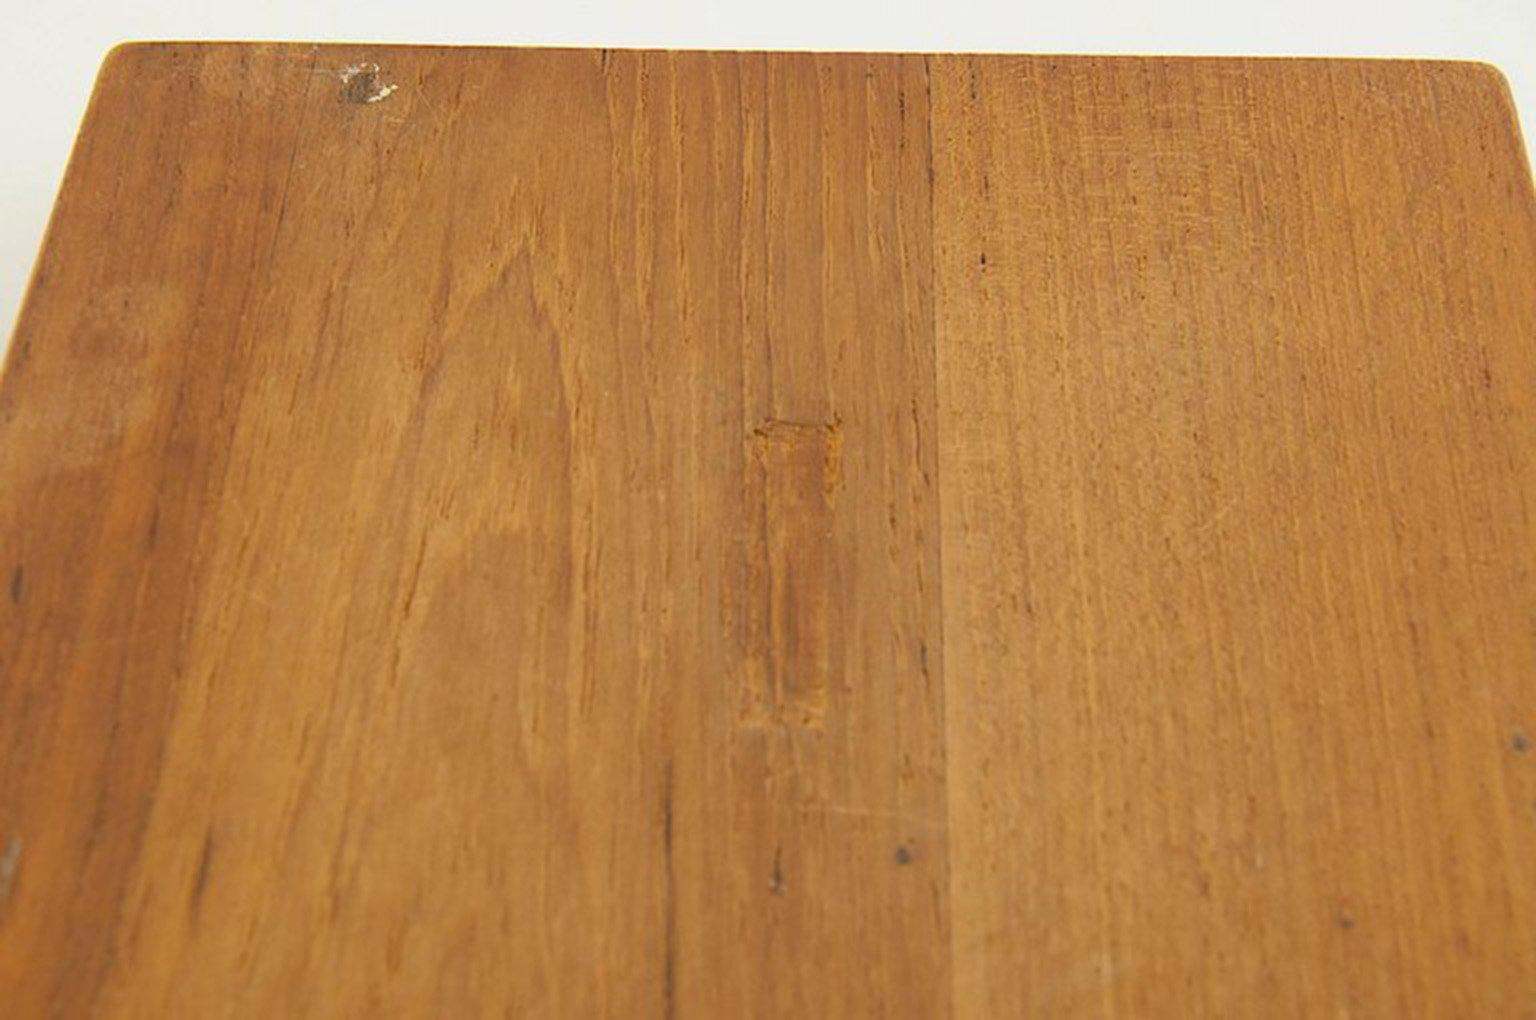 Scandinavian Wood And Metal Ashtray 1950s For Sale At Pamono